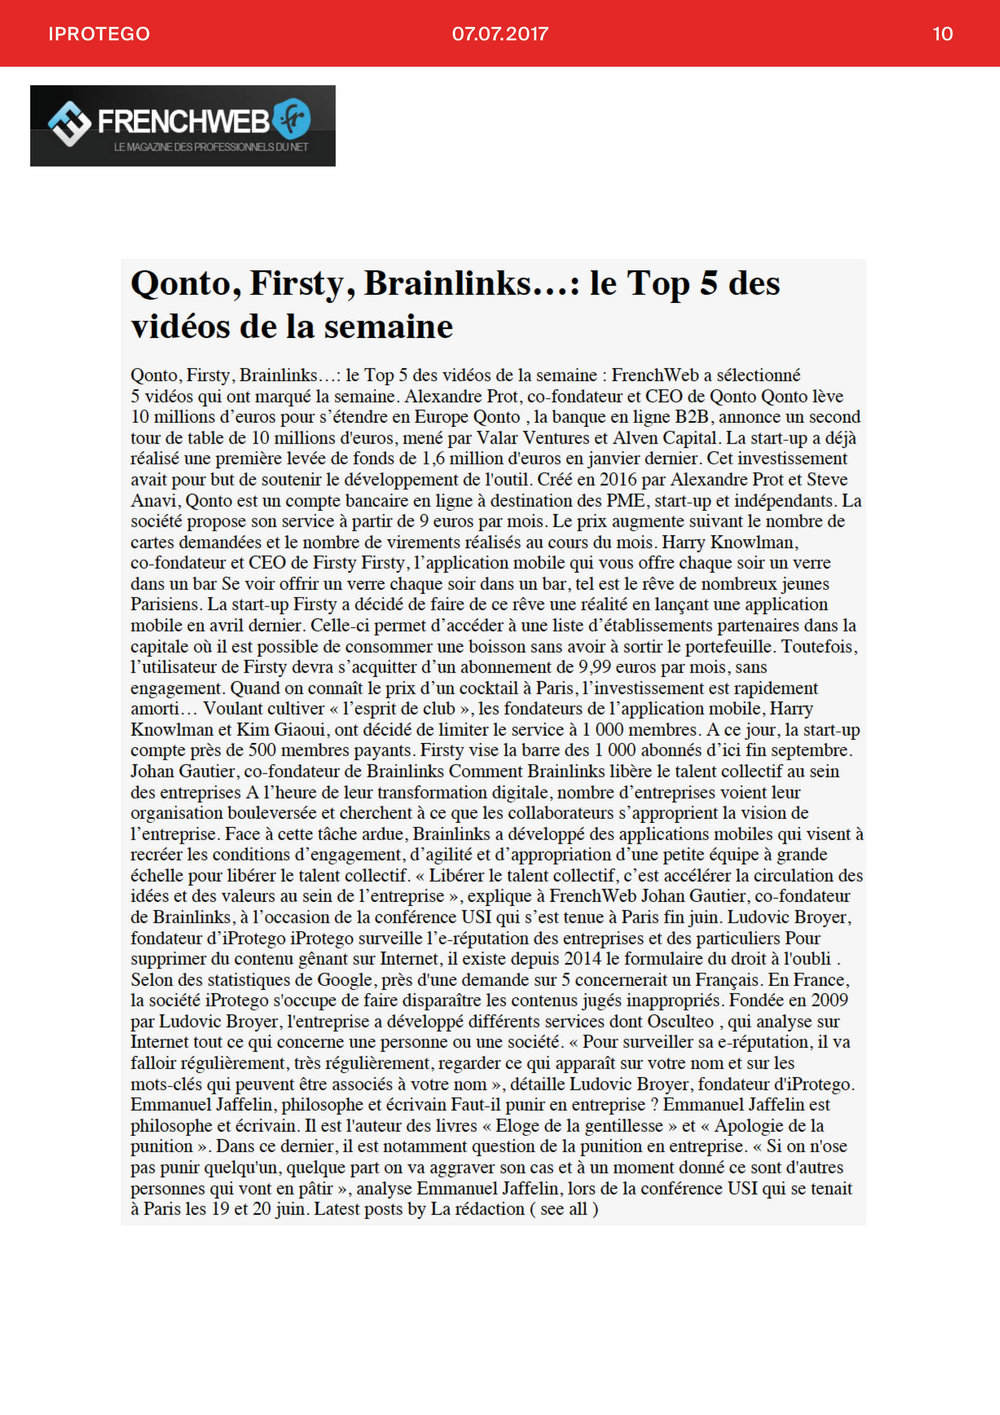 BOOKMEDIA_JUILLET_010.jpg